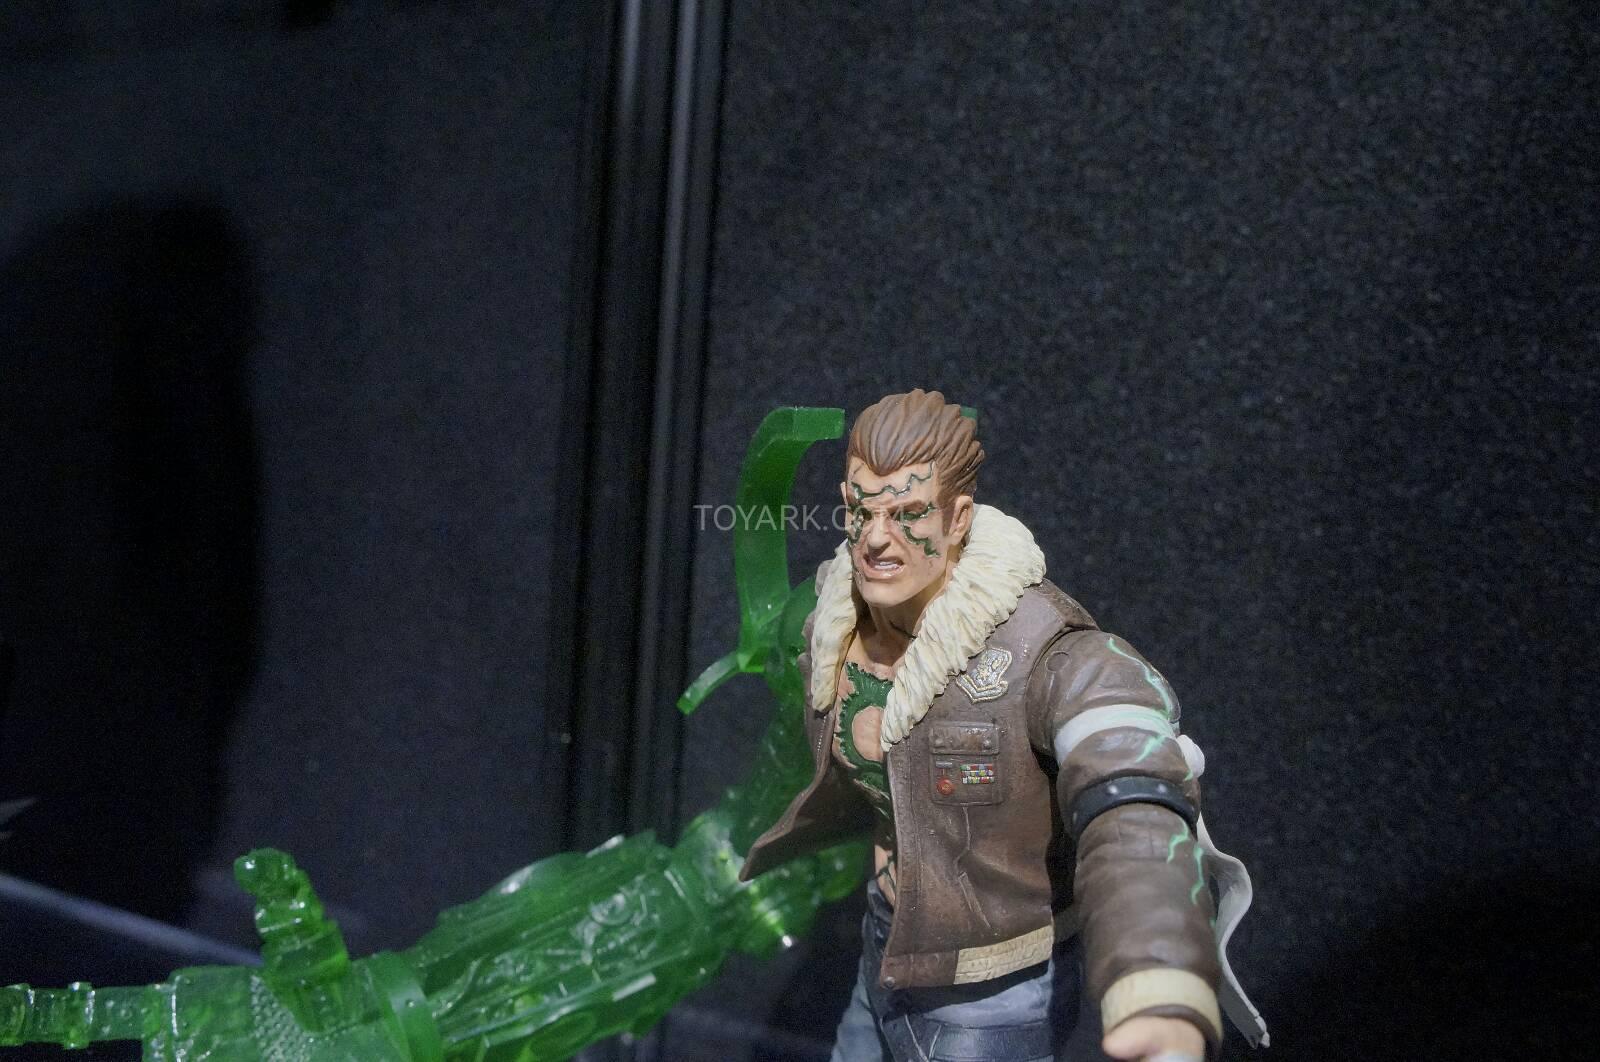 [Toy Fair 2014] DC Collectibles Toy-Fair-2014-DC-Collectibles-144